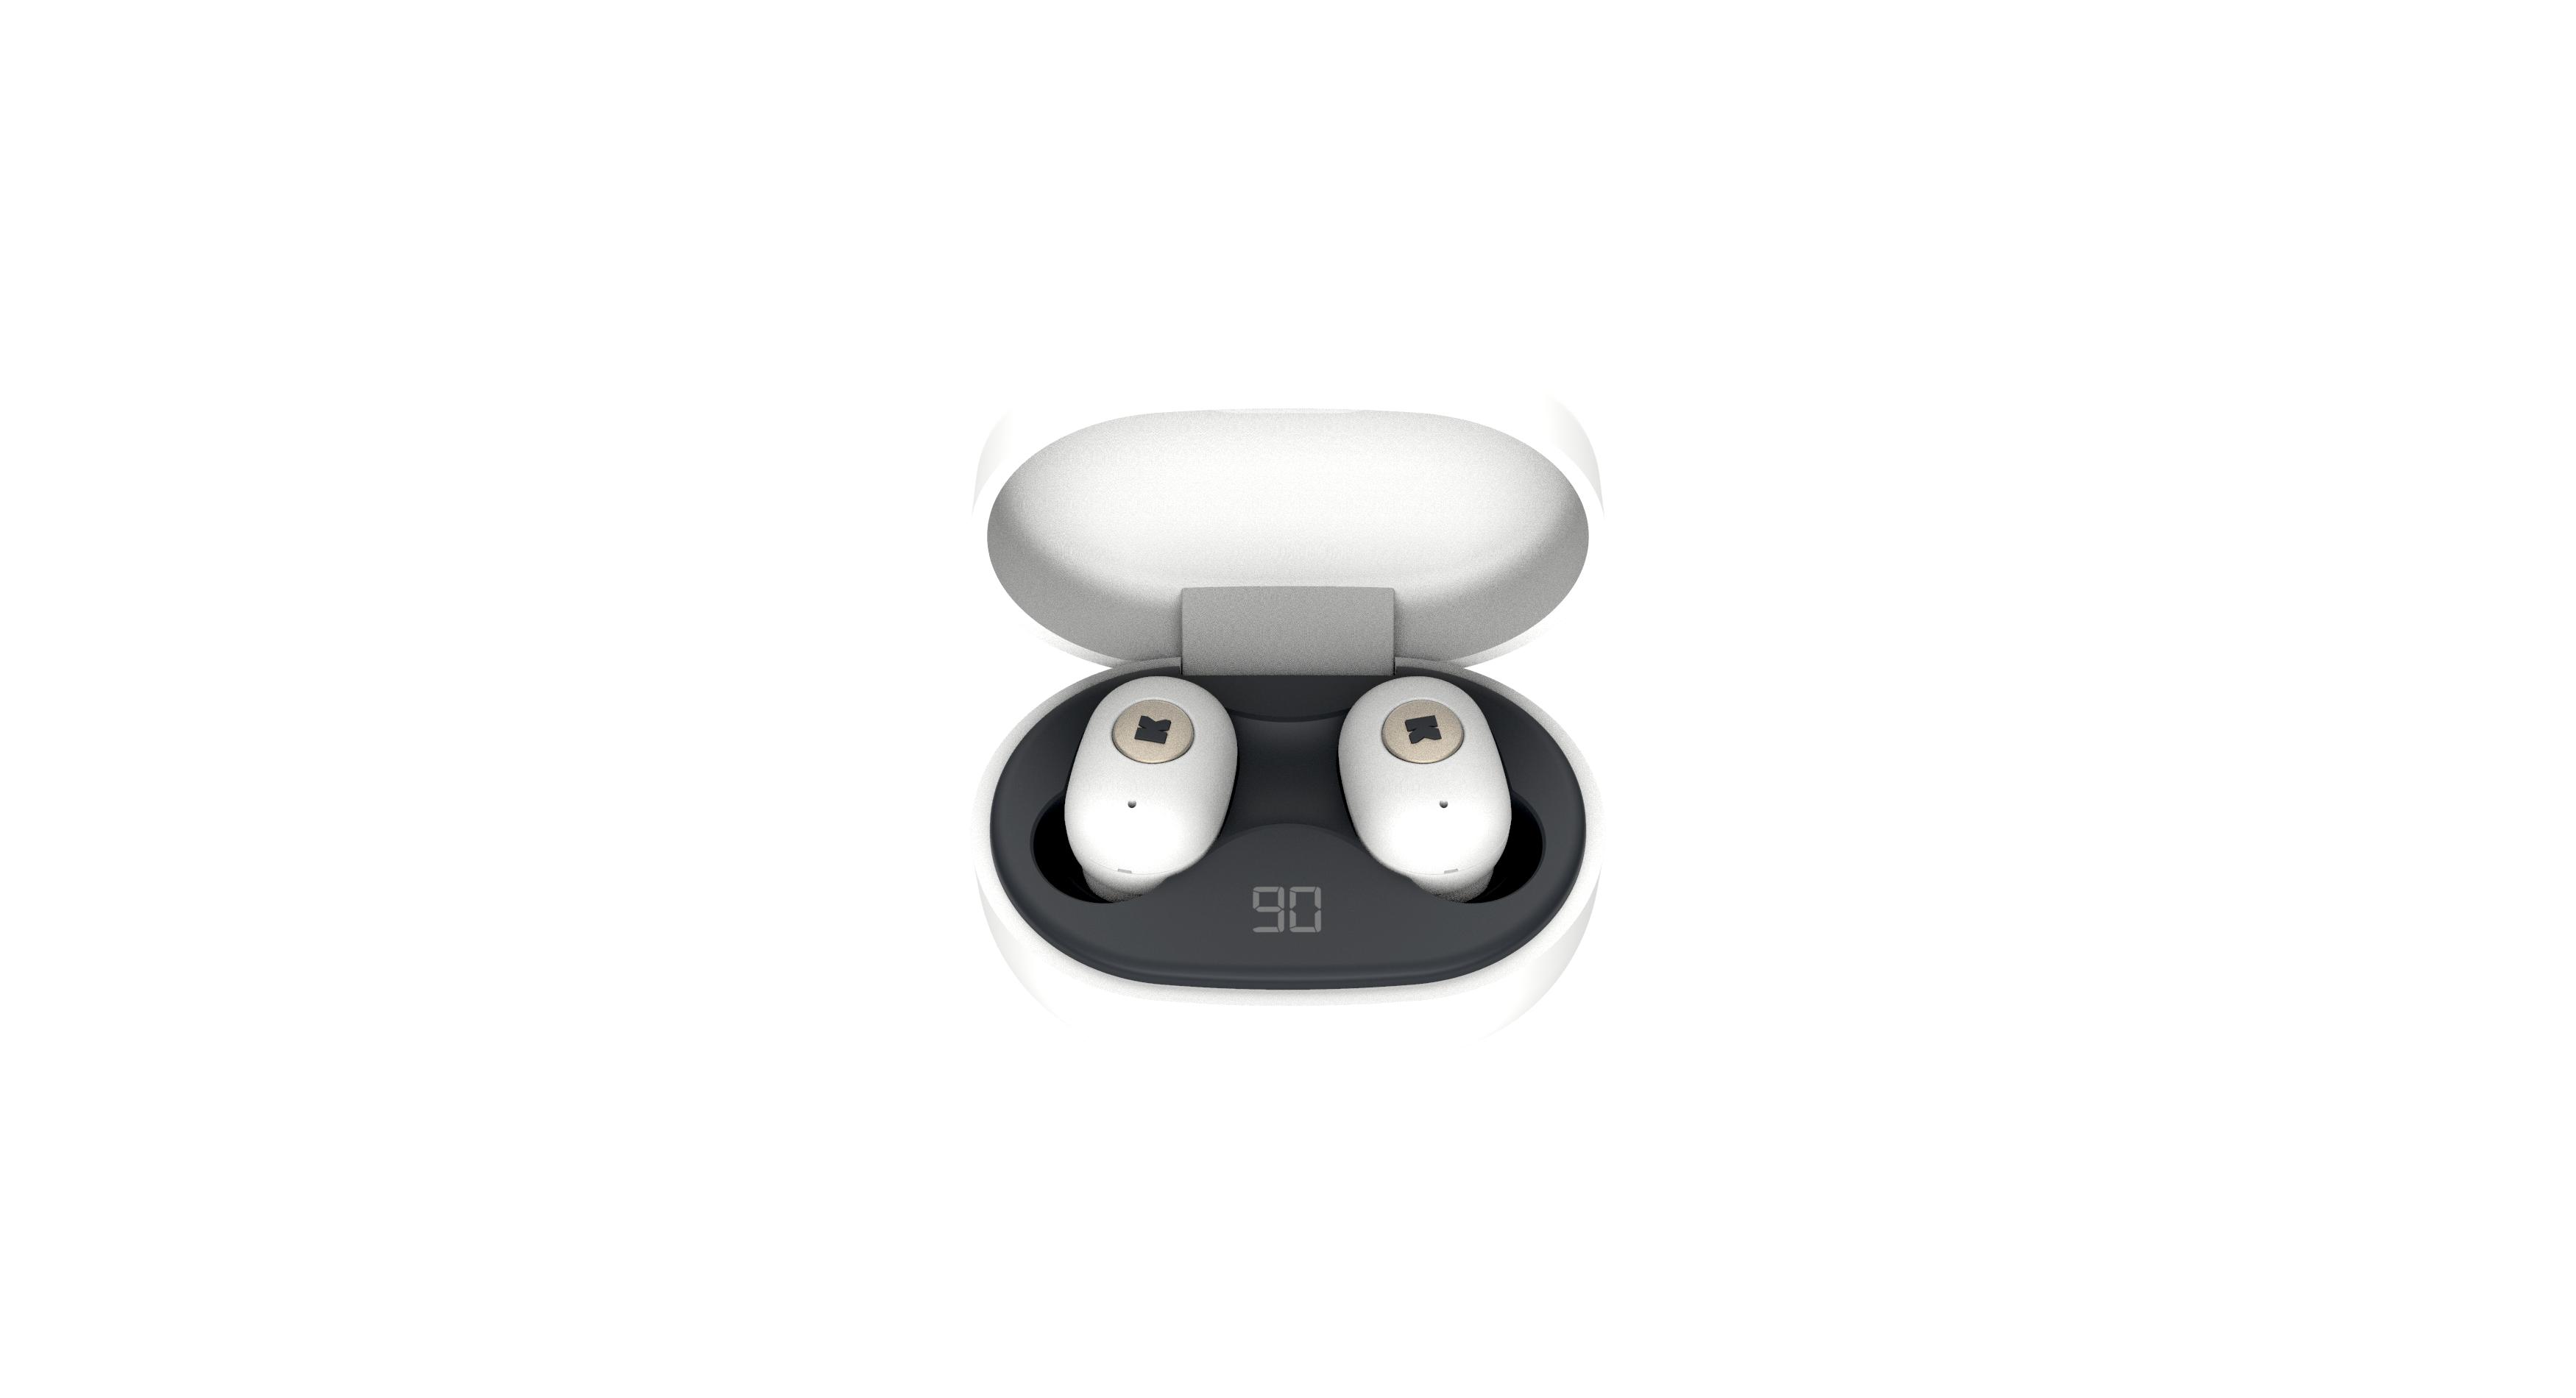 KreaFunk - aBEAN In-Ear Bluetooth Headphones - White (KFLP01)